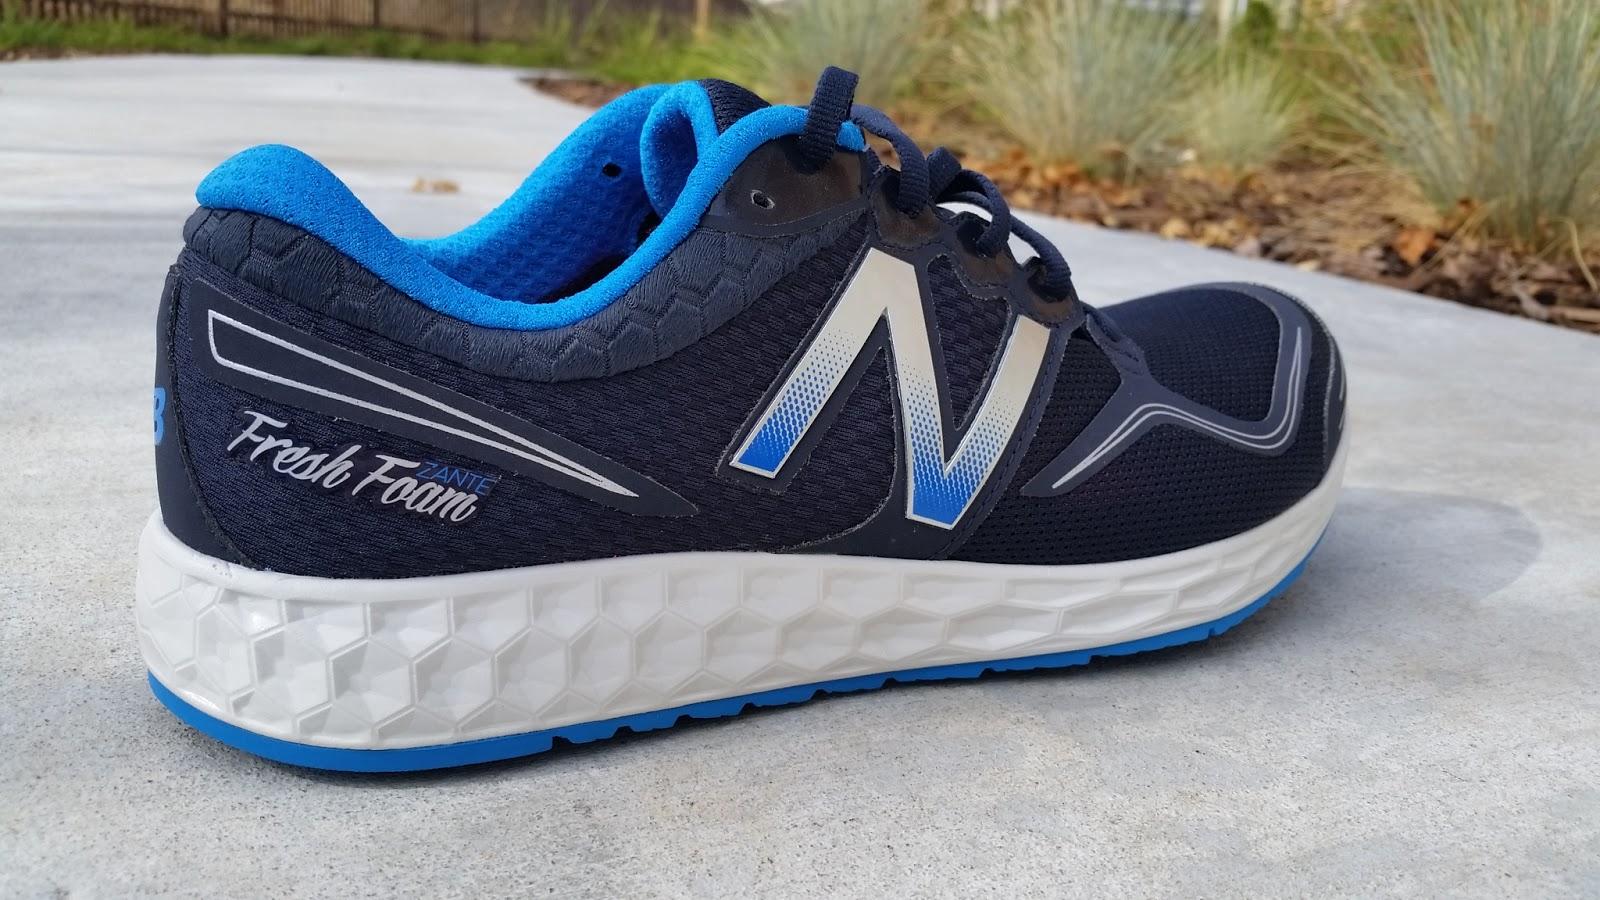 New Balance Fresh Foam Zante - Black/ Blue